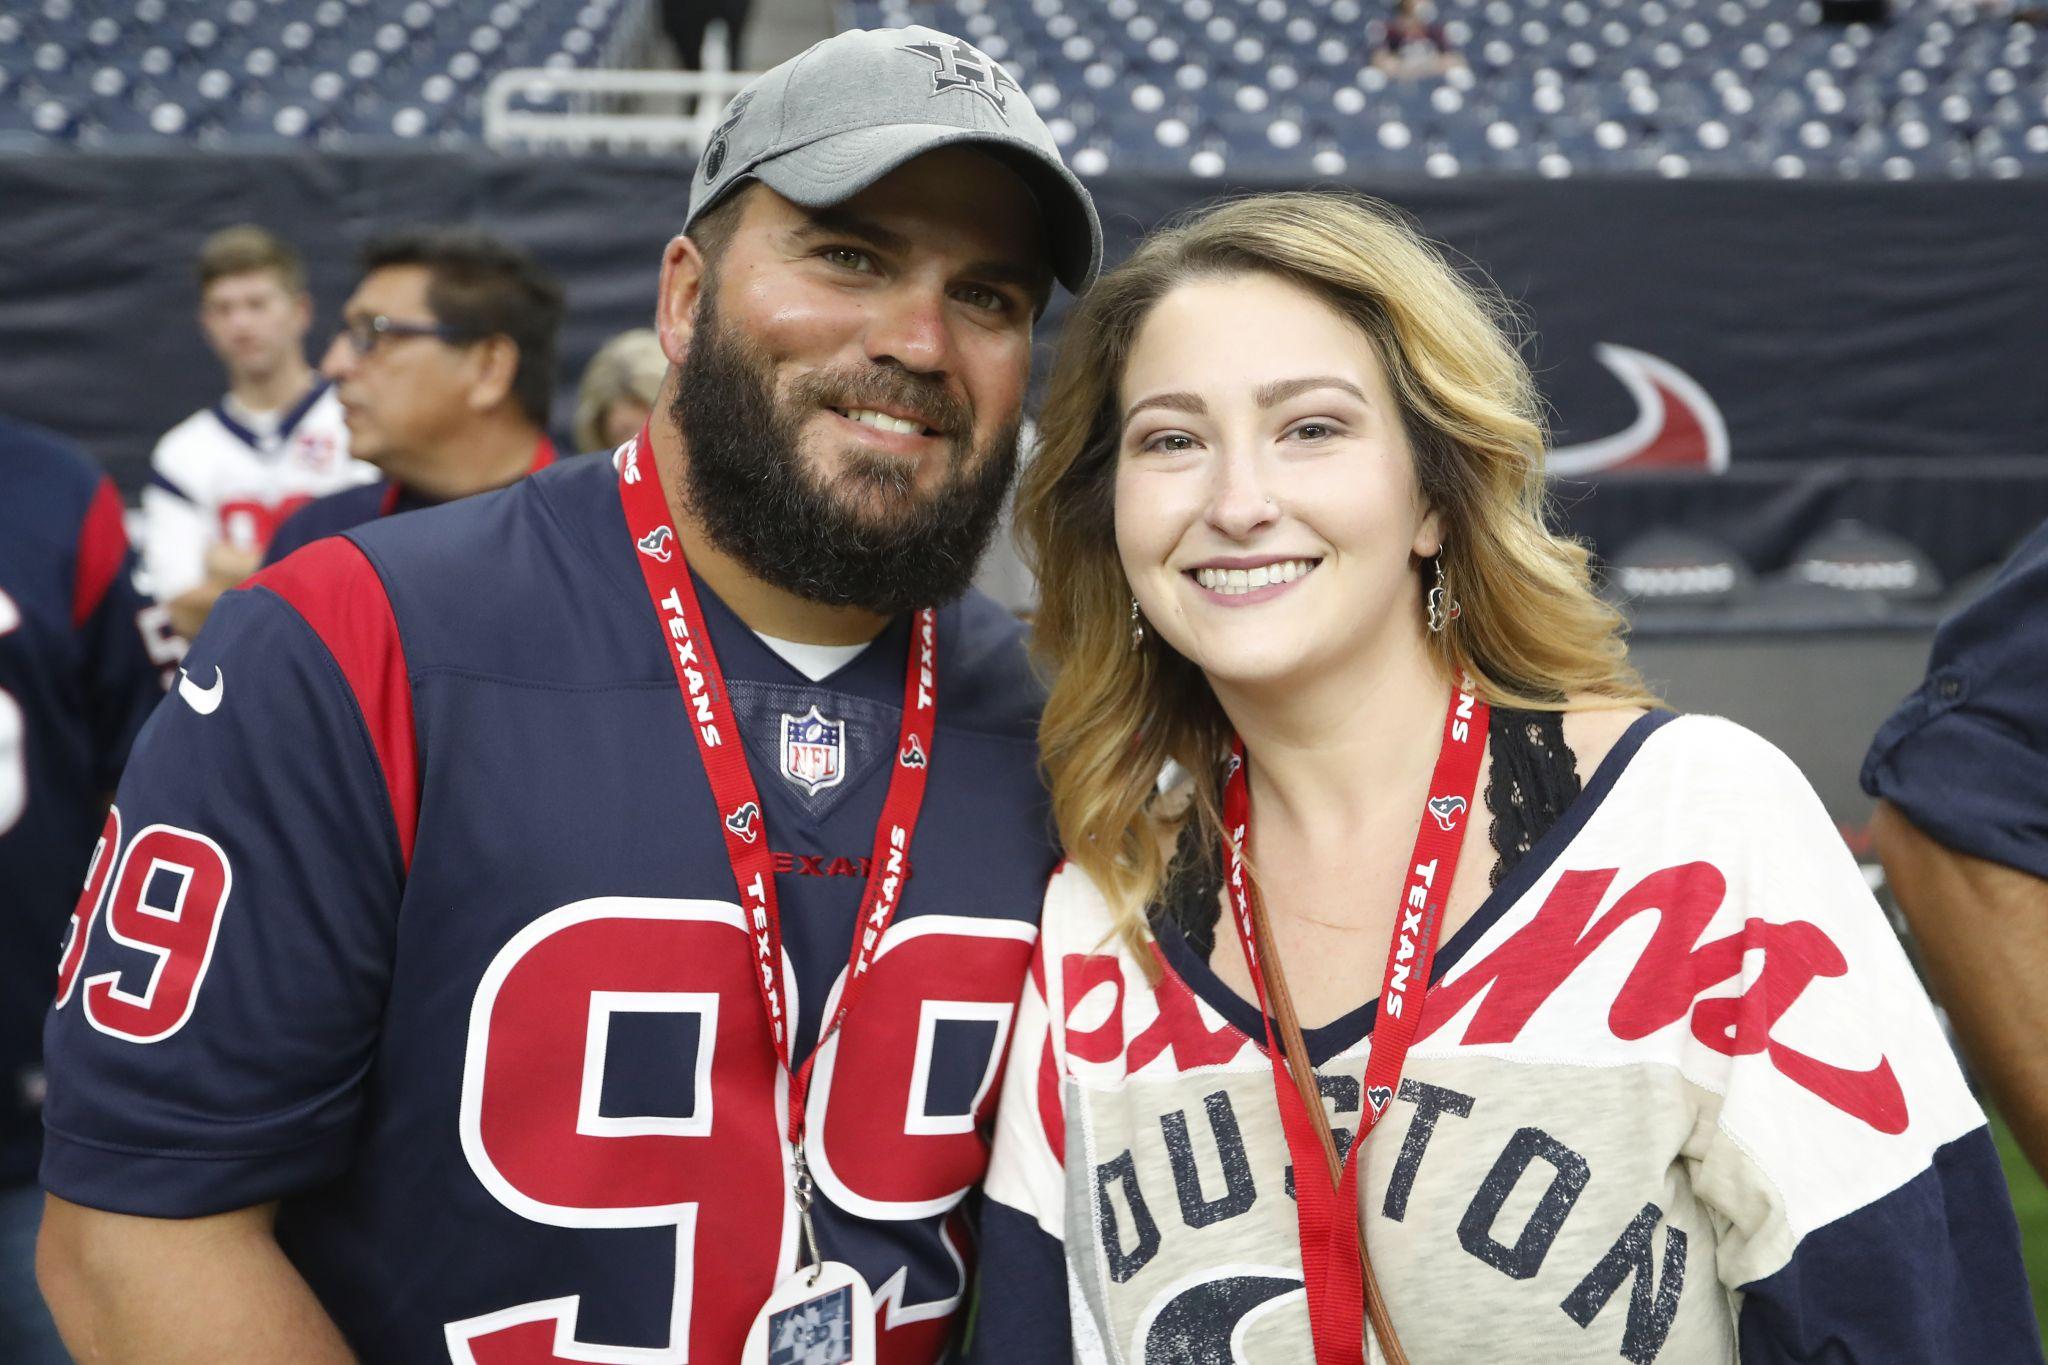 Texans fans flock to NRG Stadium for preseason action against Lions